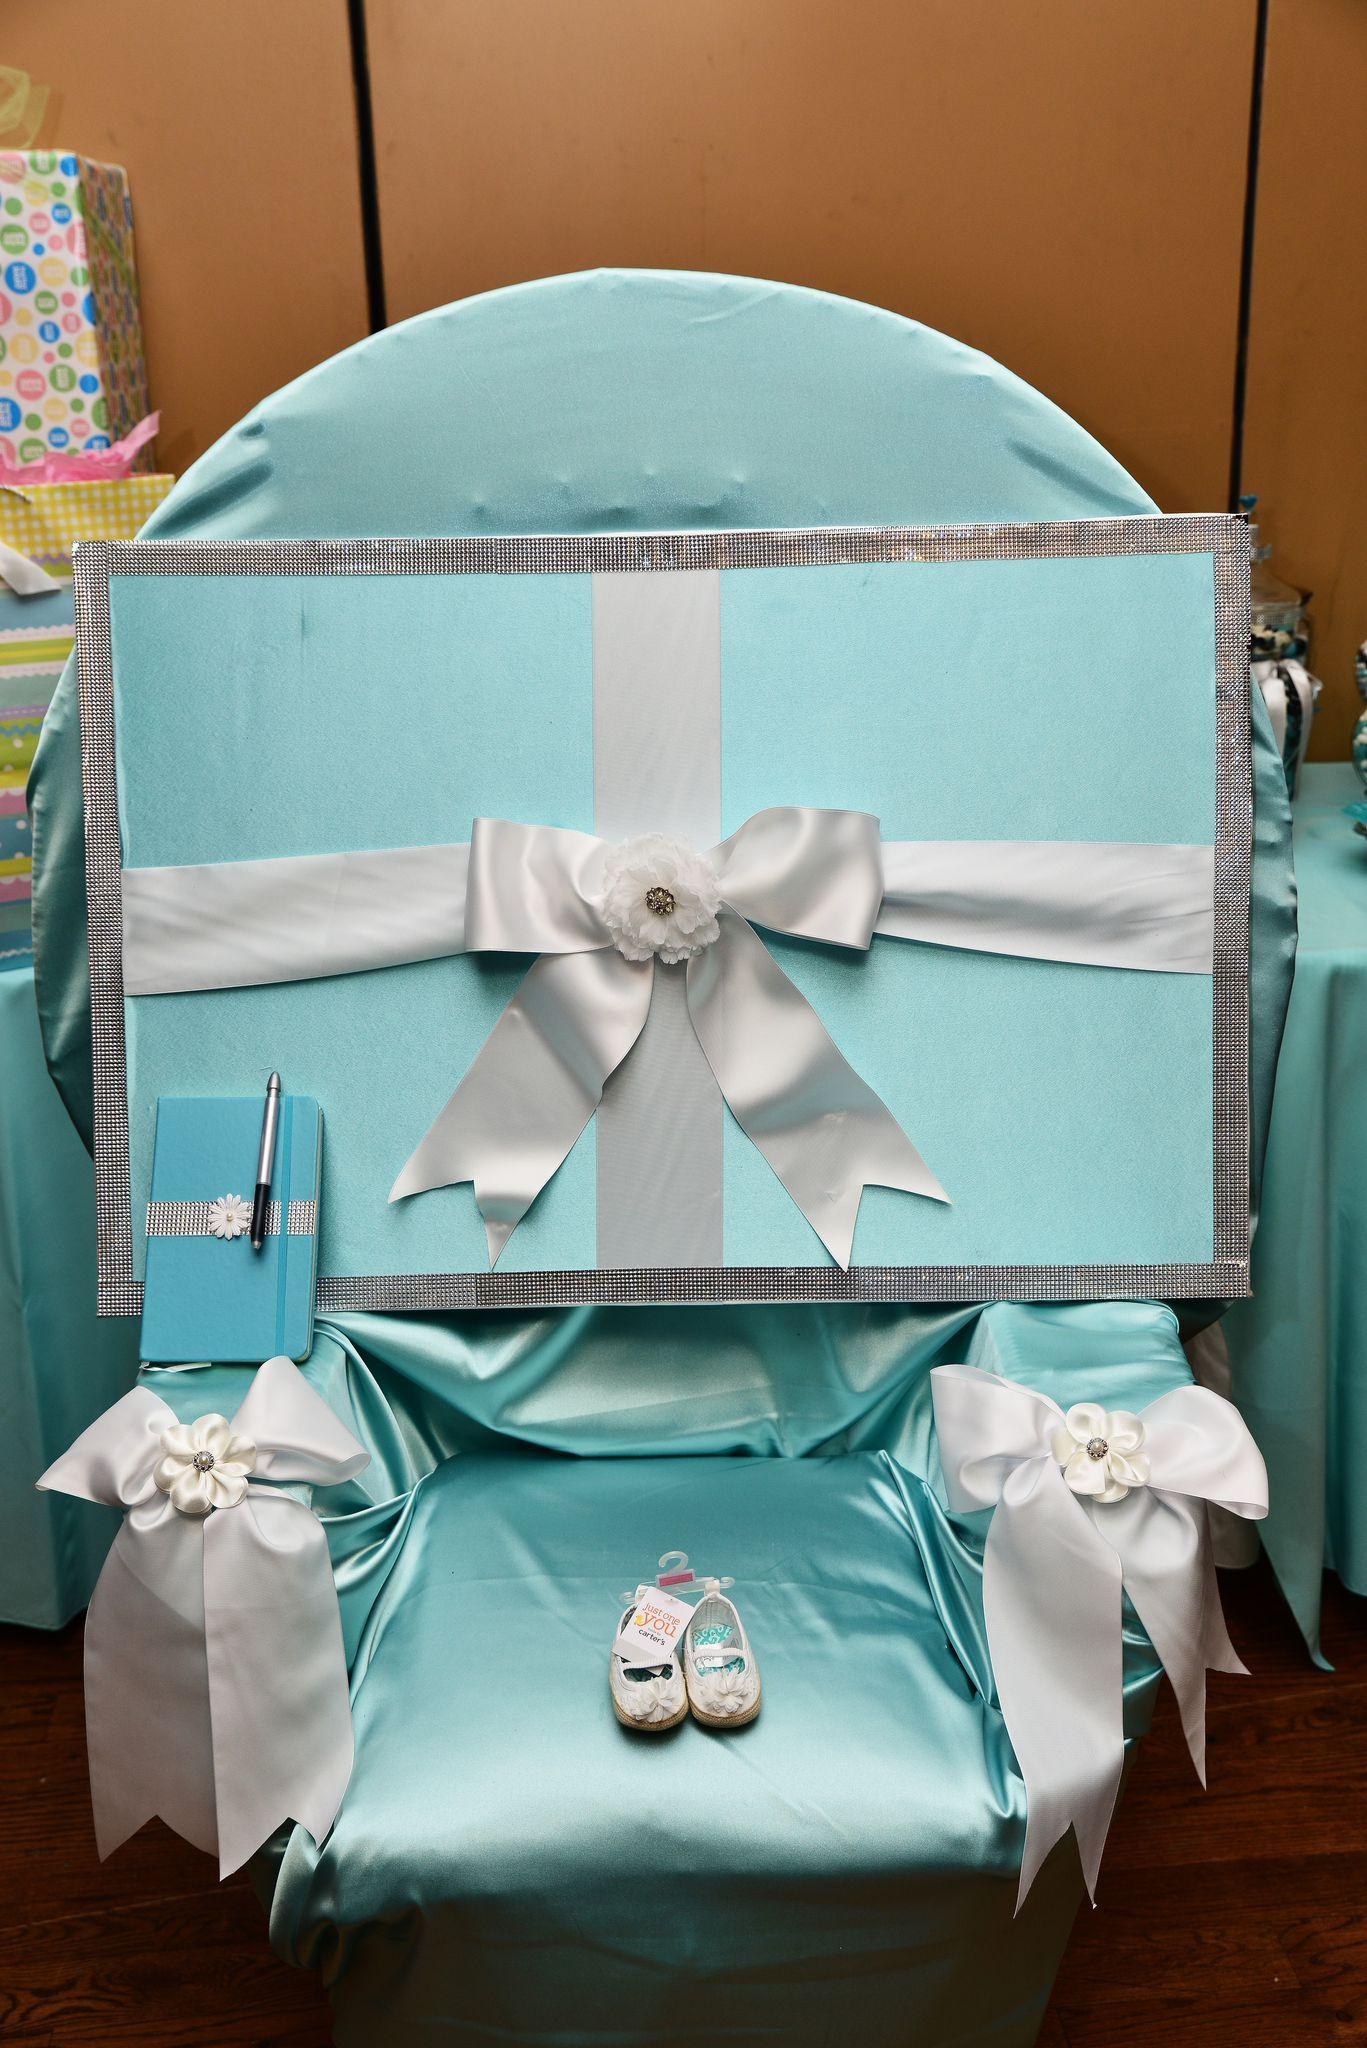 Tiffany Wicker Chair | Tiffany Baby Shower Ideas | Pinterest ...